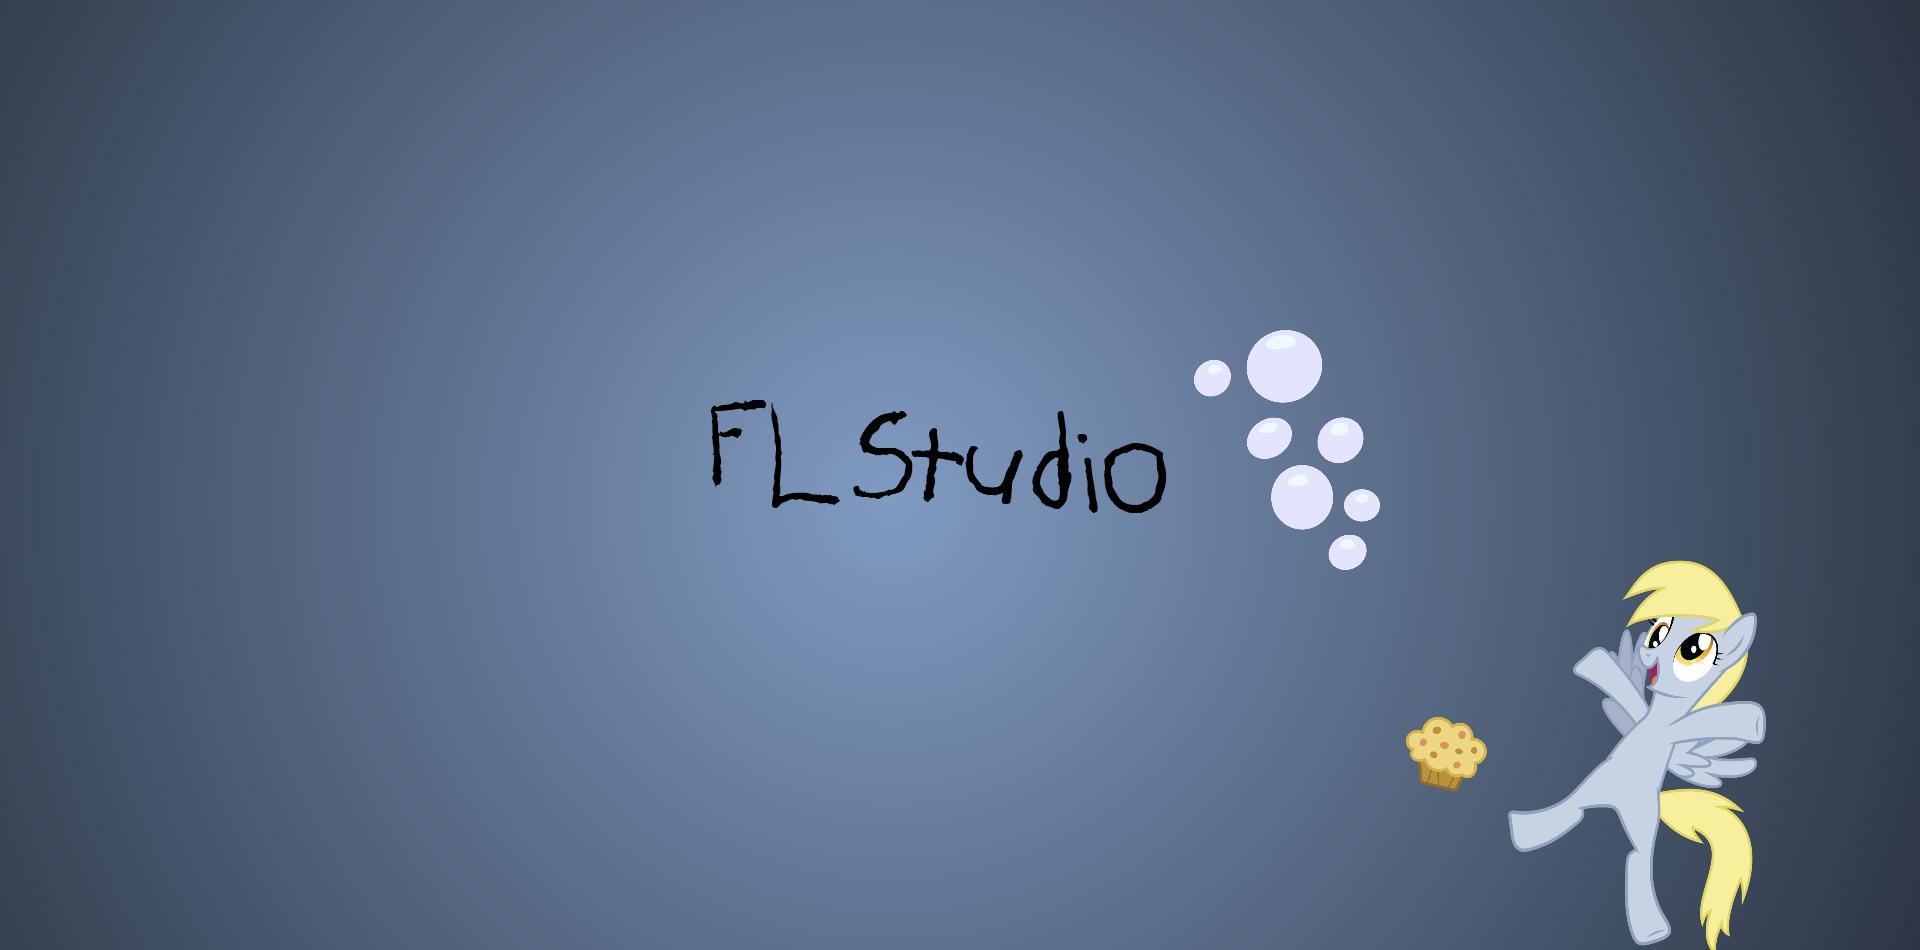 fl studio wallpapers hd - photo #7